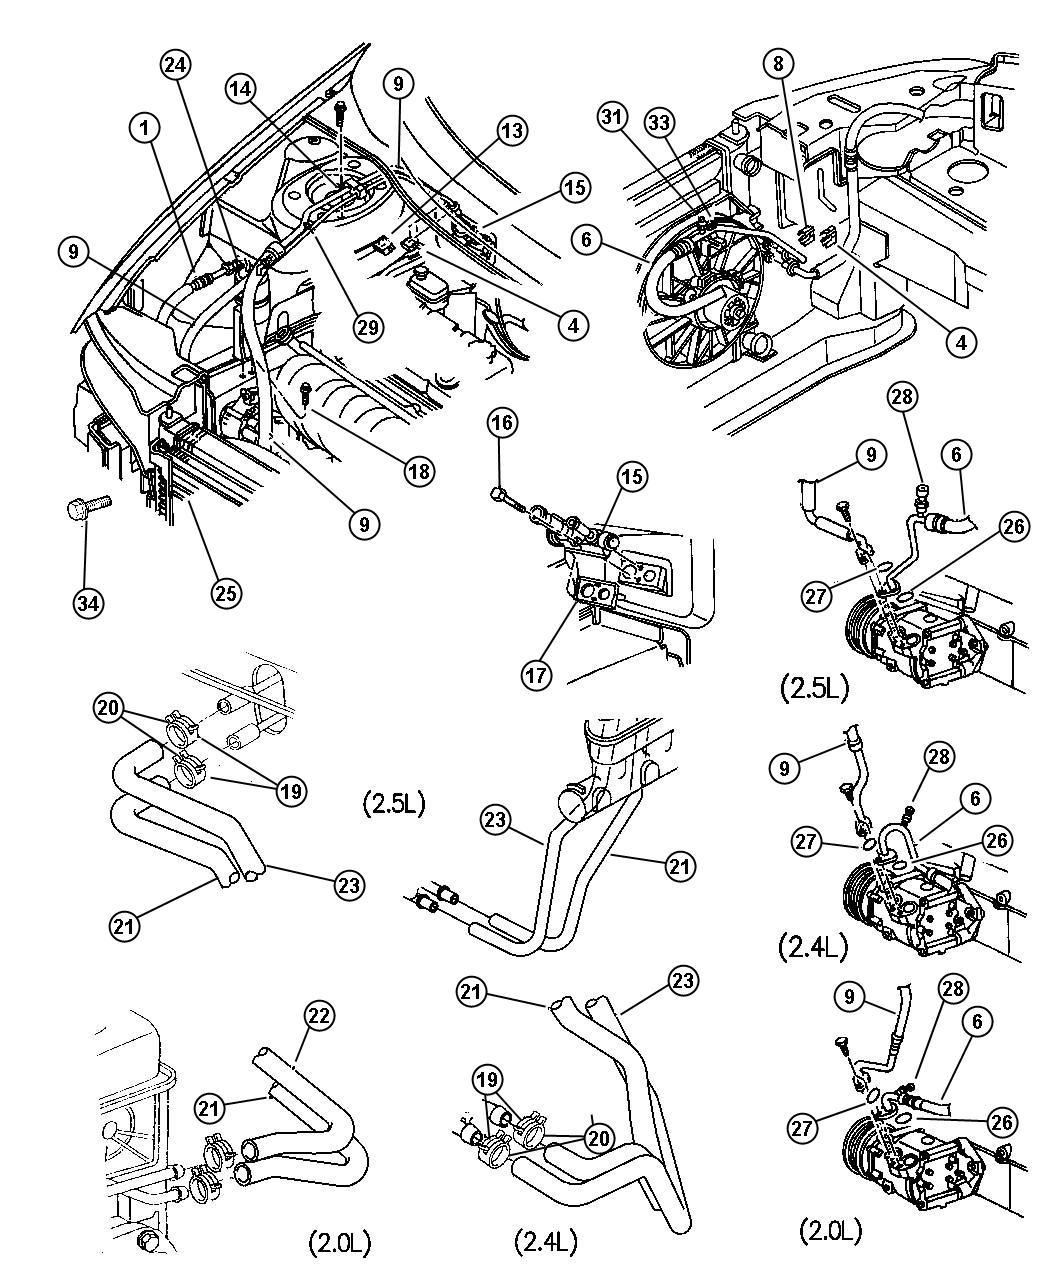 1989 Isuzu Trooper Parts And Accessories